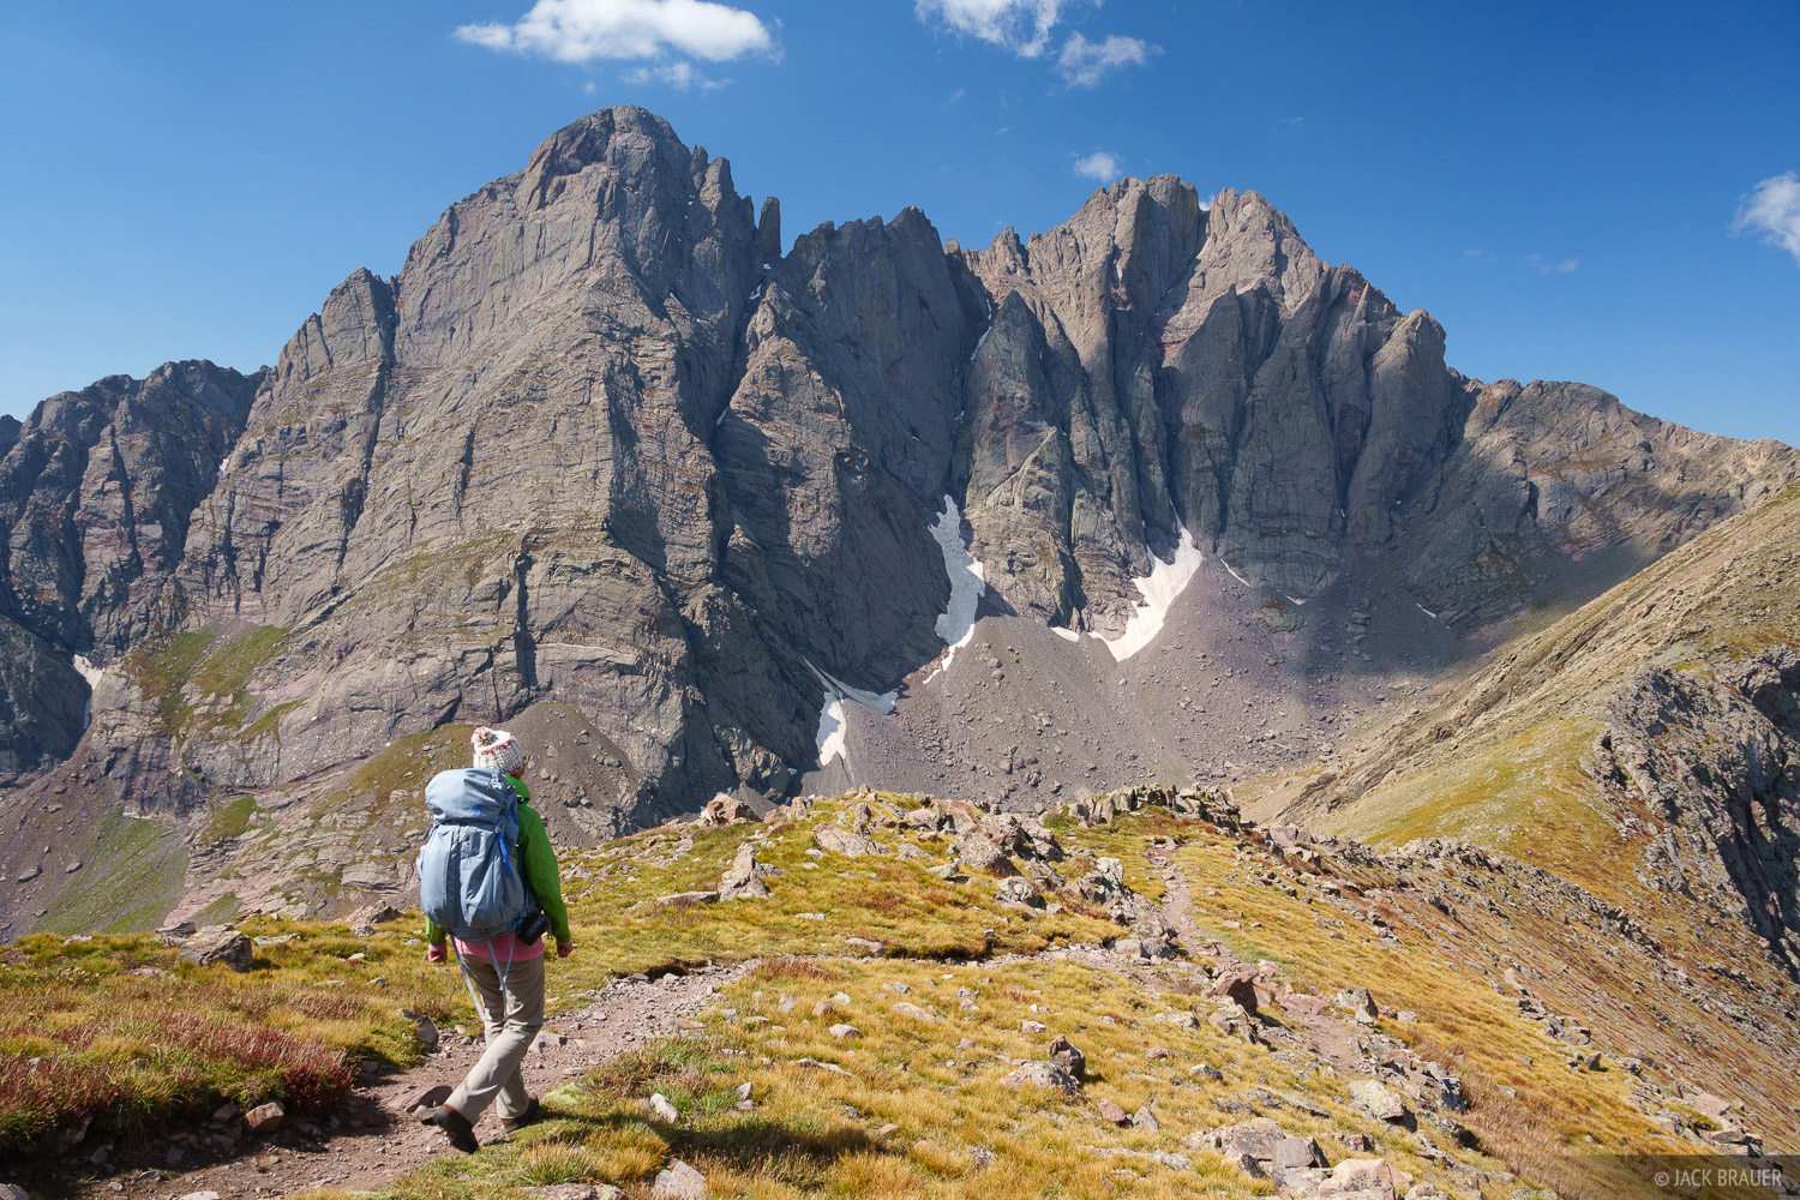 Colorado, Crestone Needle, Crestone Peak, Humboldt Peak, Sangre de Cristos, 14er, hiking, Sangre de Cristo Wilderness, photo